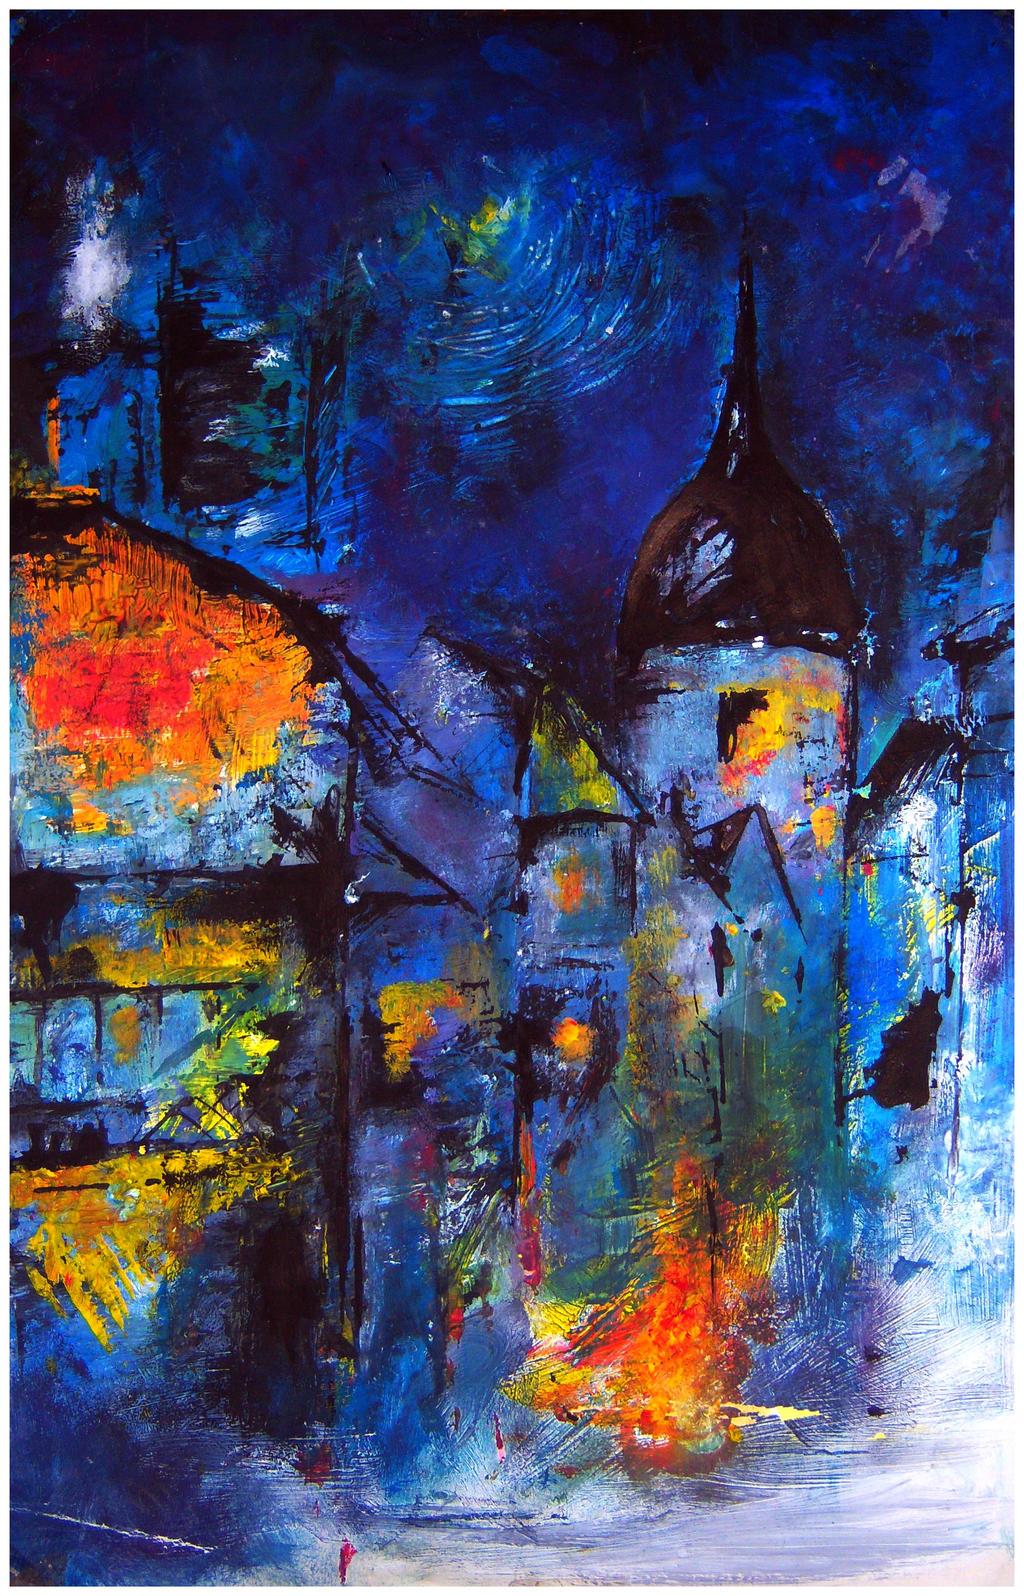 The Arsonist by Sevaresien